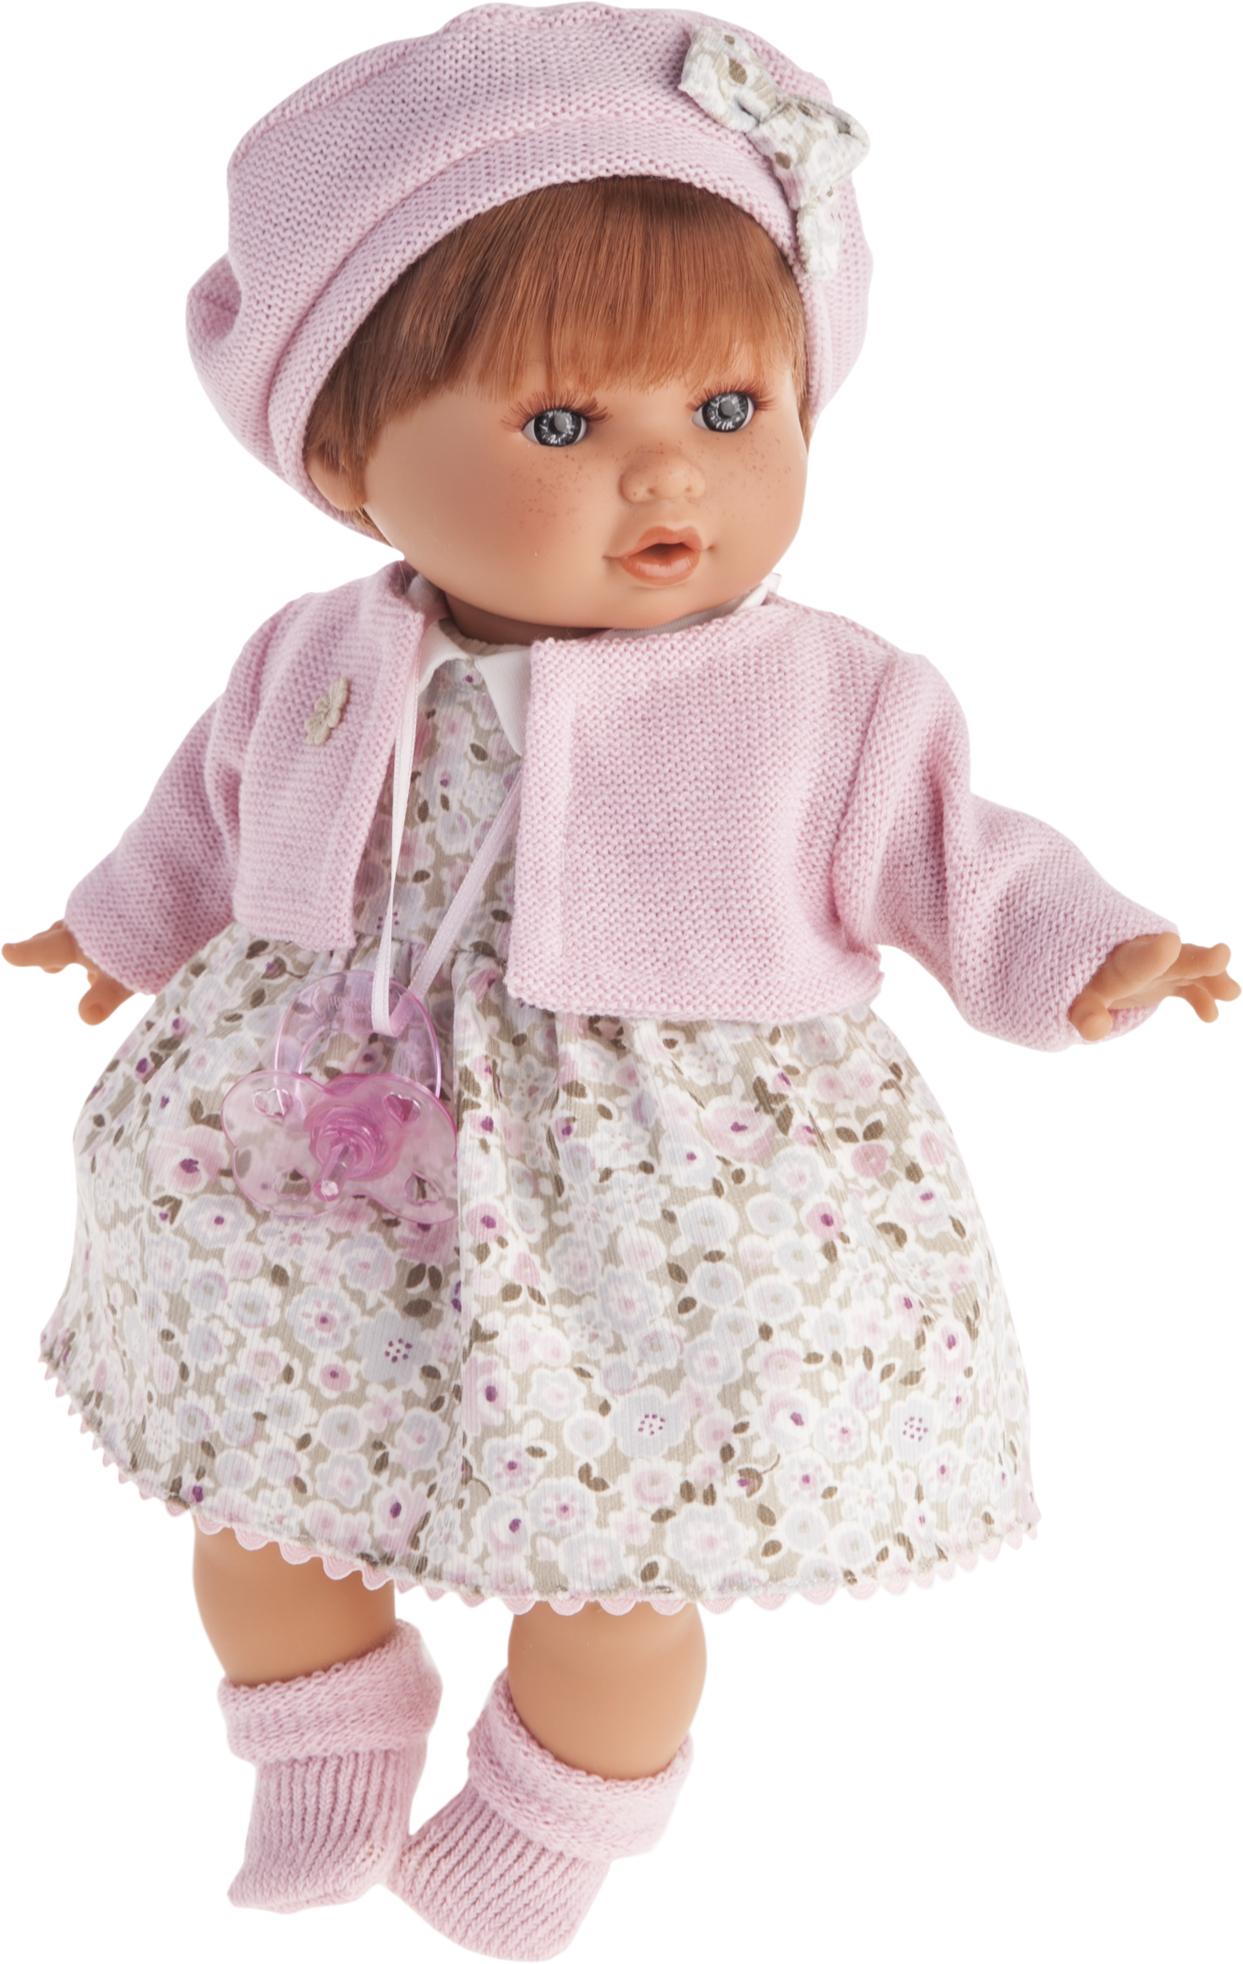 Кукла Кристиана в розовом, плачет, 30 см. от Toyway